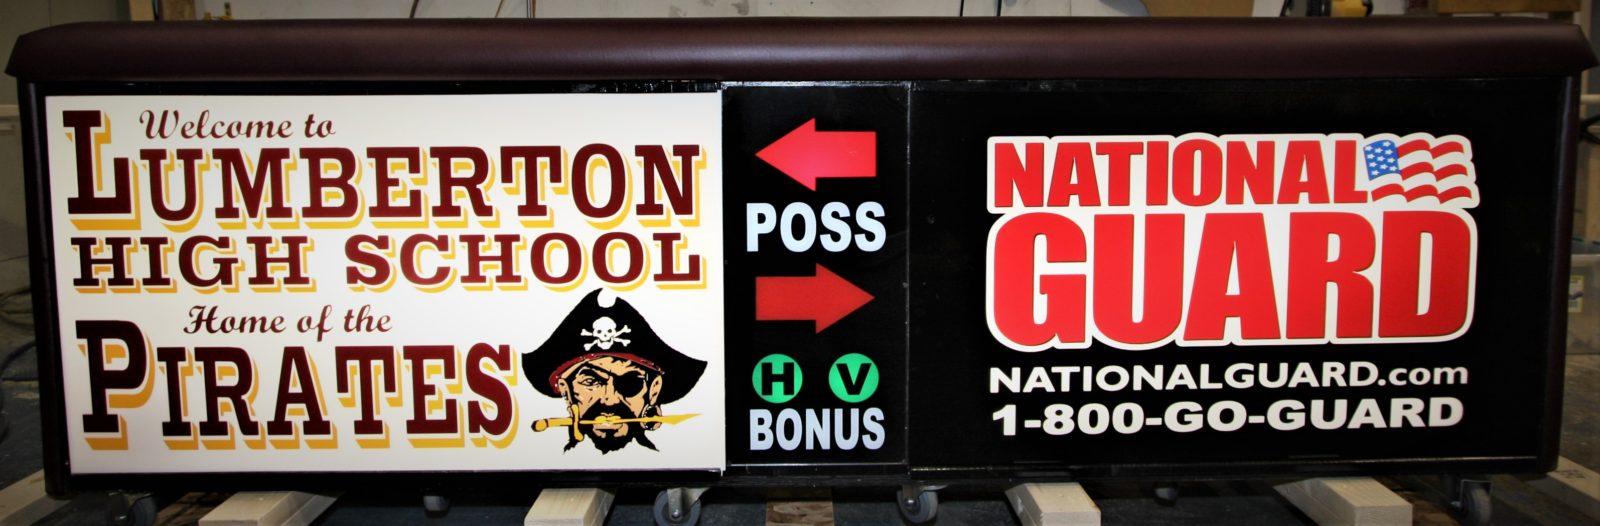 Lumberton high school scoring table North Carolina Army National Guard NCARNG